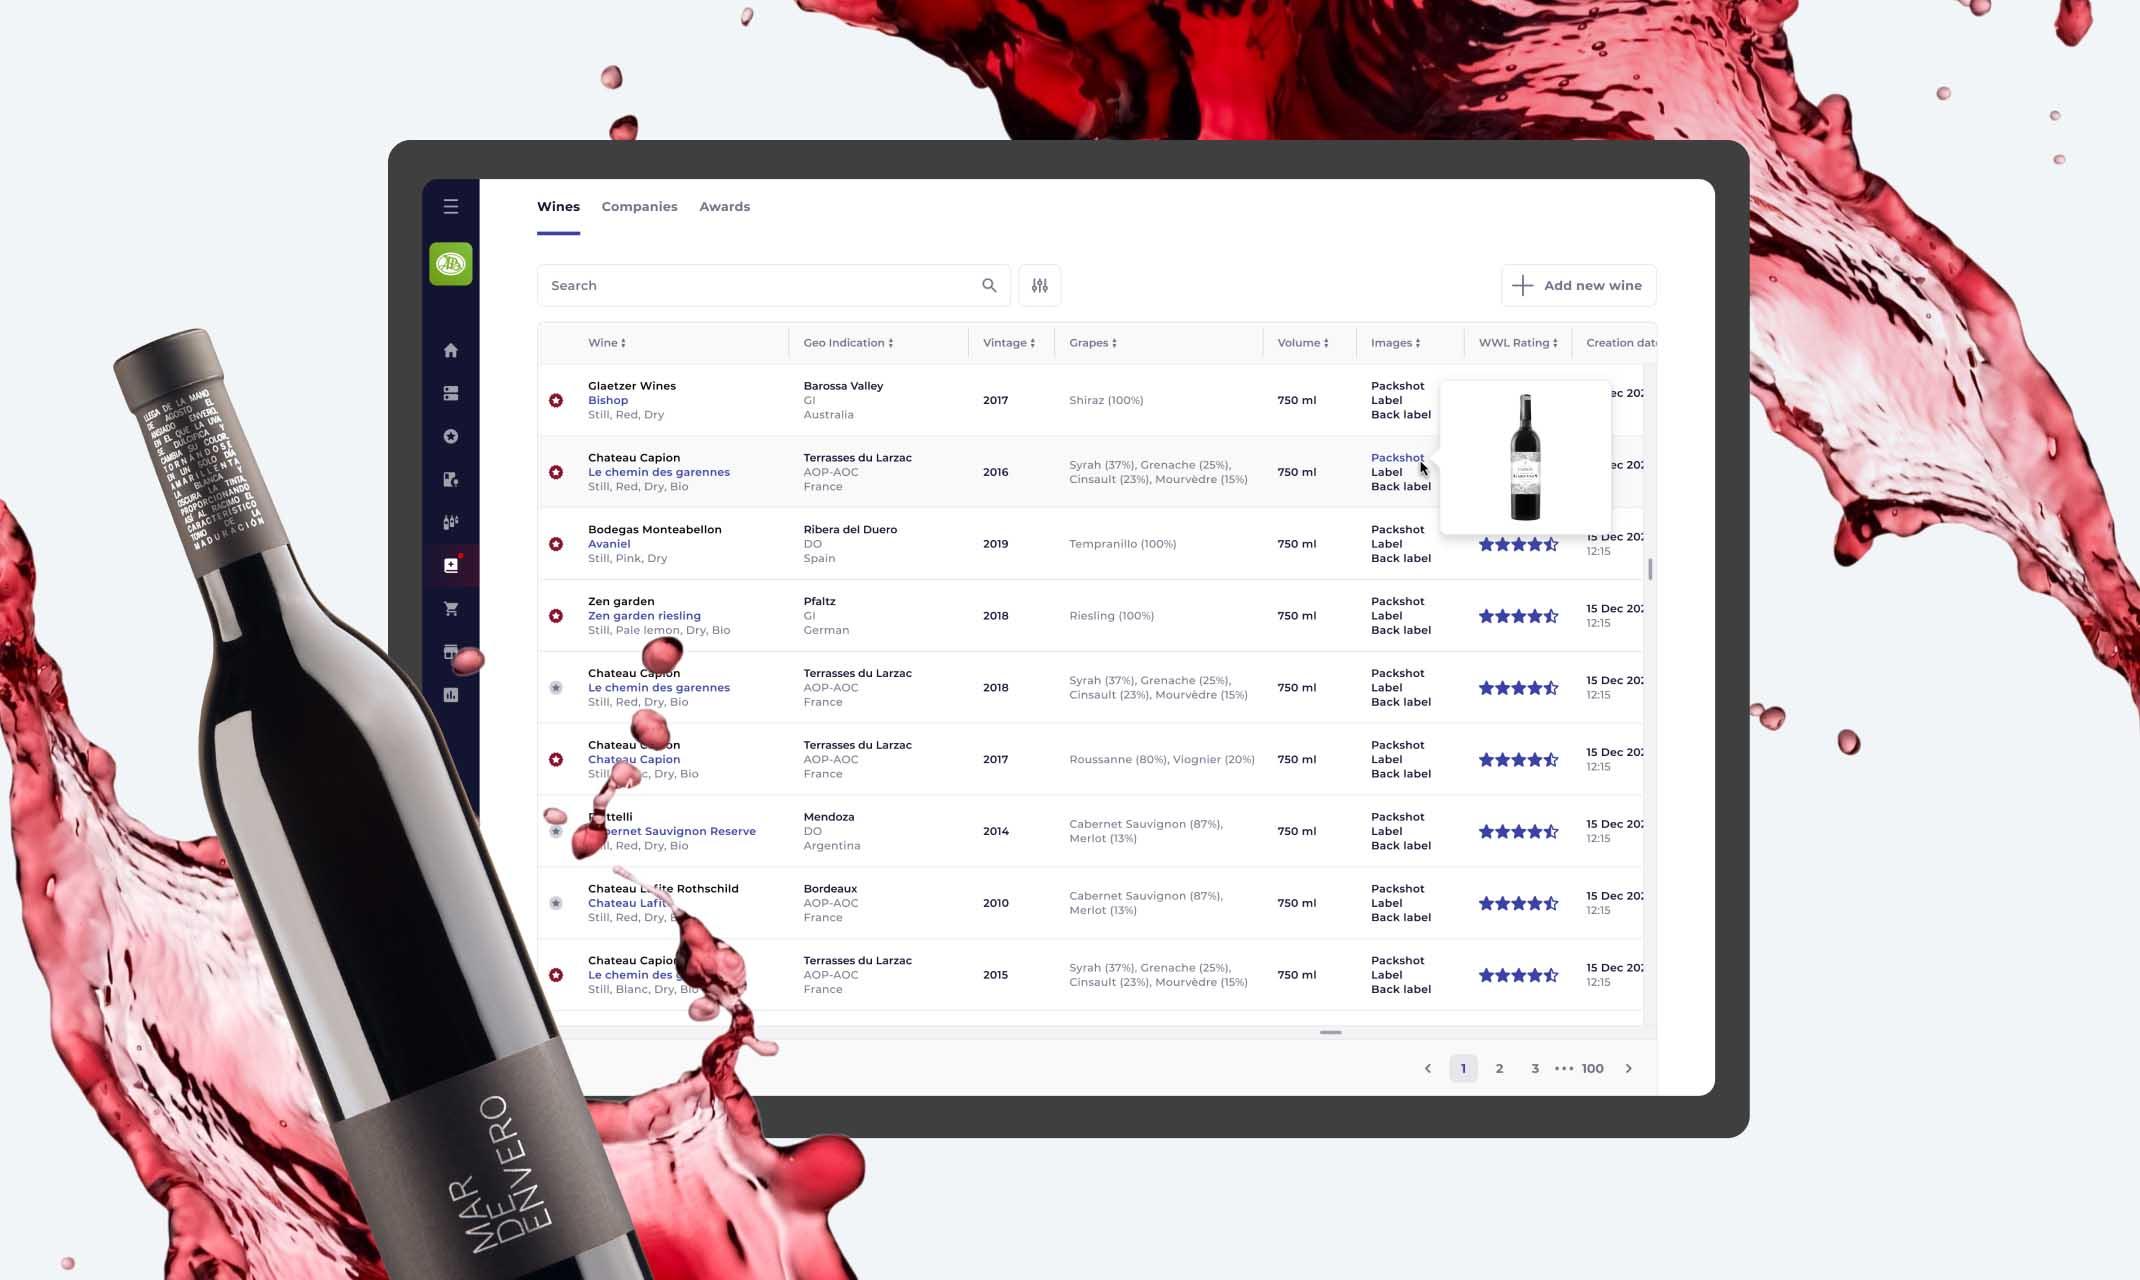 World Wine List